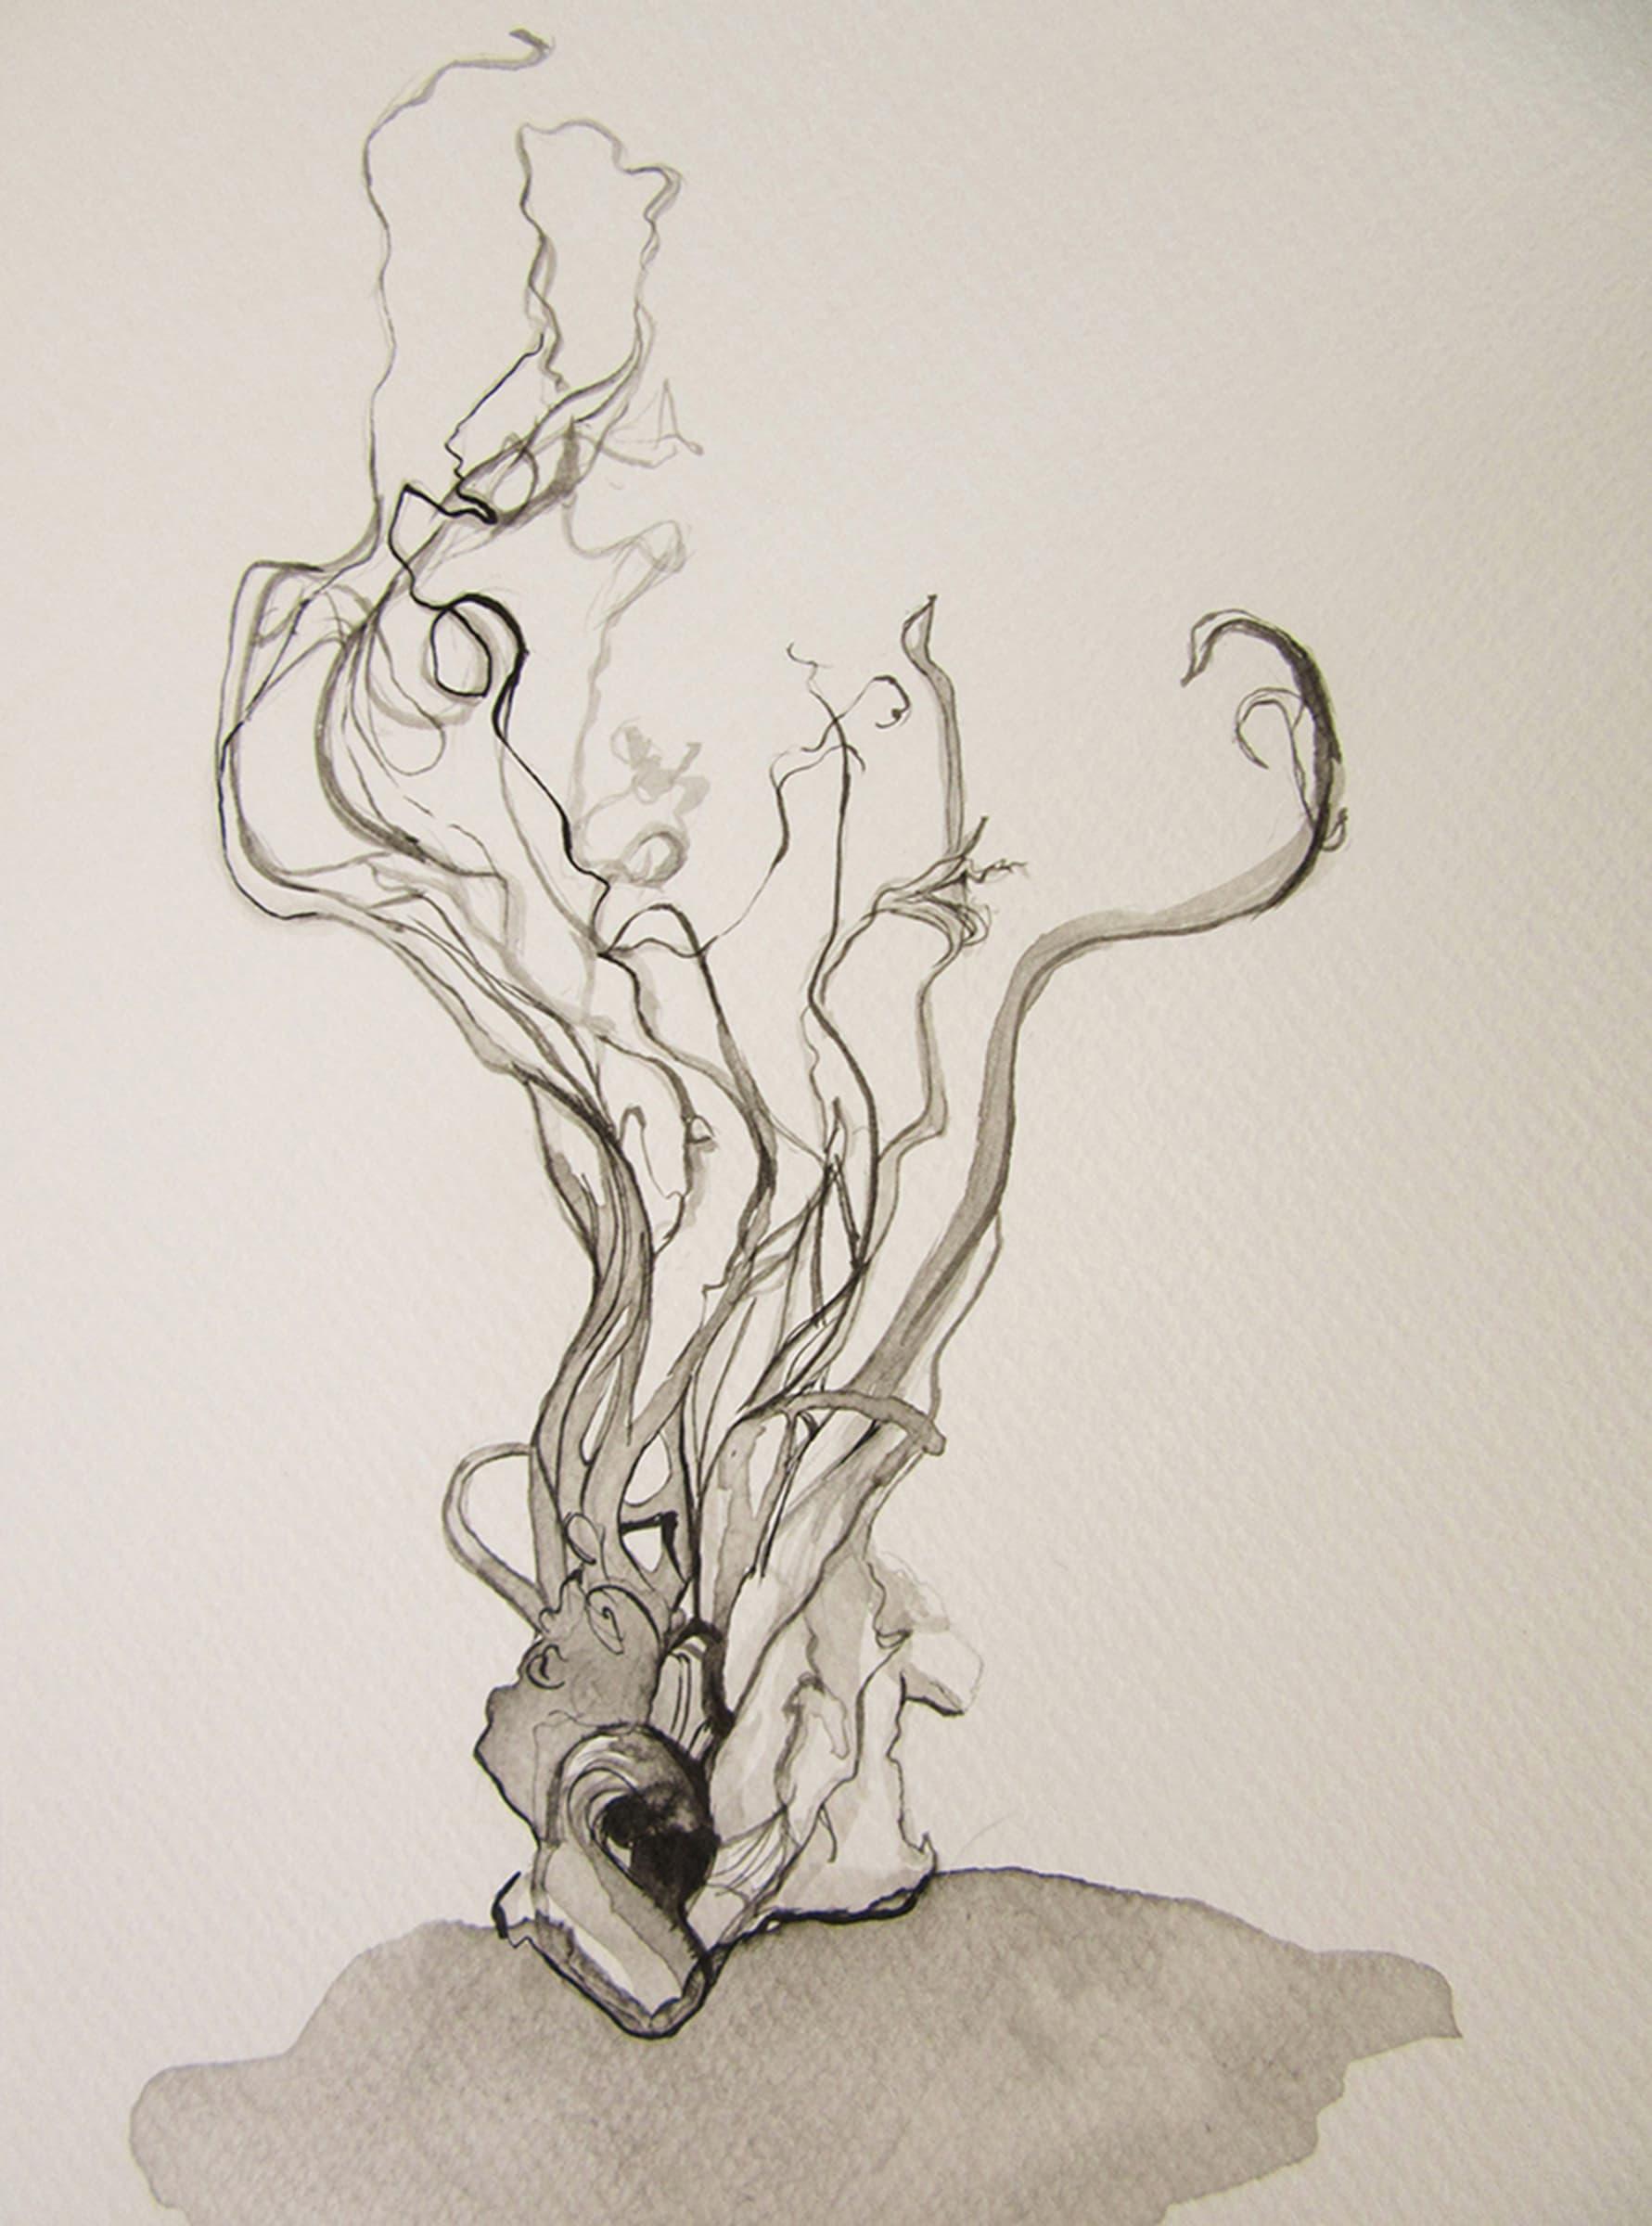 <span class=&#34;link fancybox-details-link&#34;><a href=&#34;/artists/49-sharon-moses/works/2504-sharon-moses-precious-2018/&#34;>View Detail Page</a></span><div class=&#34;artist&#34;><strong>Sharon Moses</strong></div> <div class=&#34;title&#34;><em>Precious</em>, 2018</div> <div class=&#34;medium&#34;>Ink On 300Gsm Cold Pressed Acid-Free Paper</div> <div class=&#34;dimensions&#34;>14.8cm x 21cm</div><div class=&#34;price&#34;>R500.00</div>